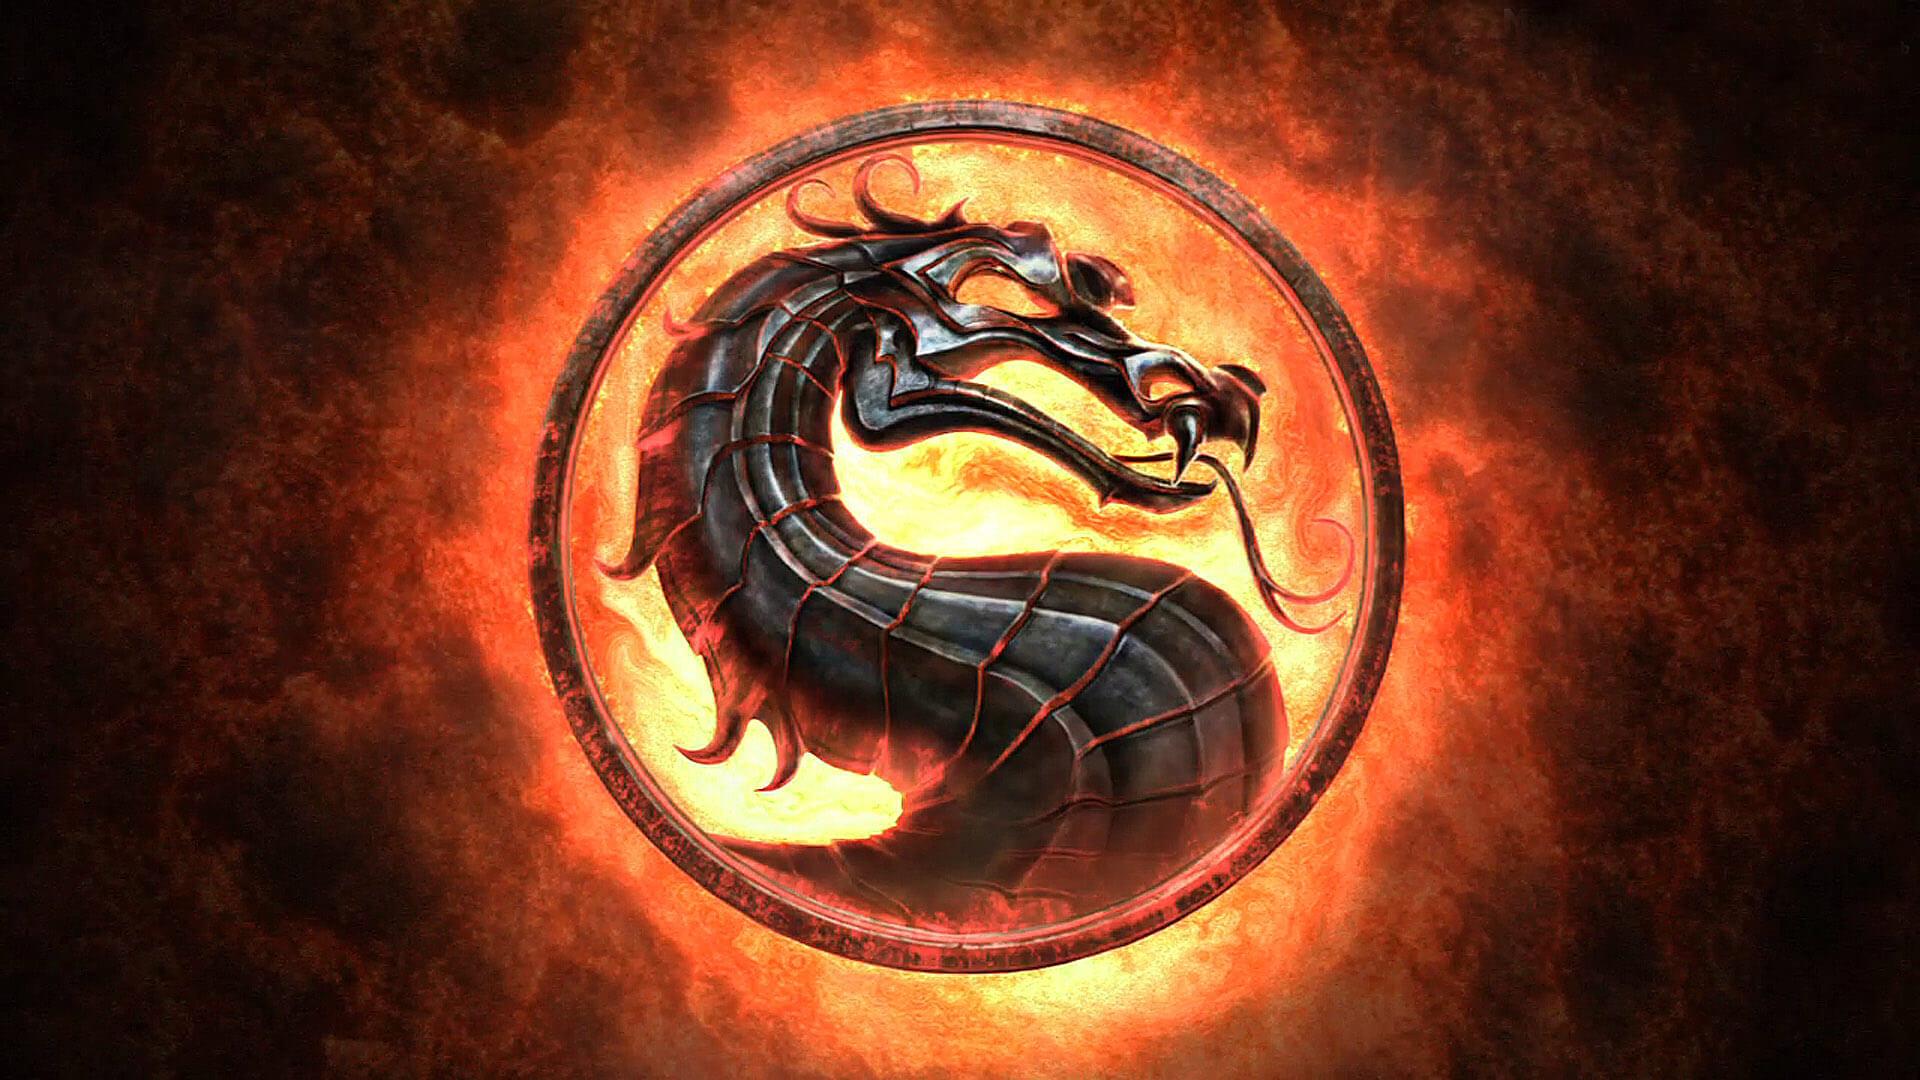 Mortal Kombat 11 reached 8 million point sale's target